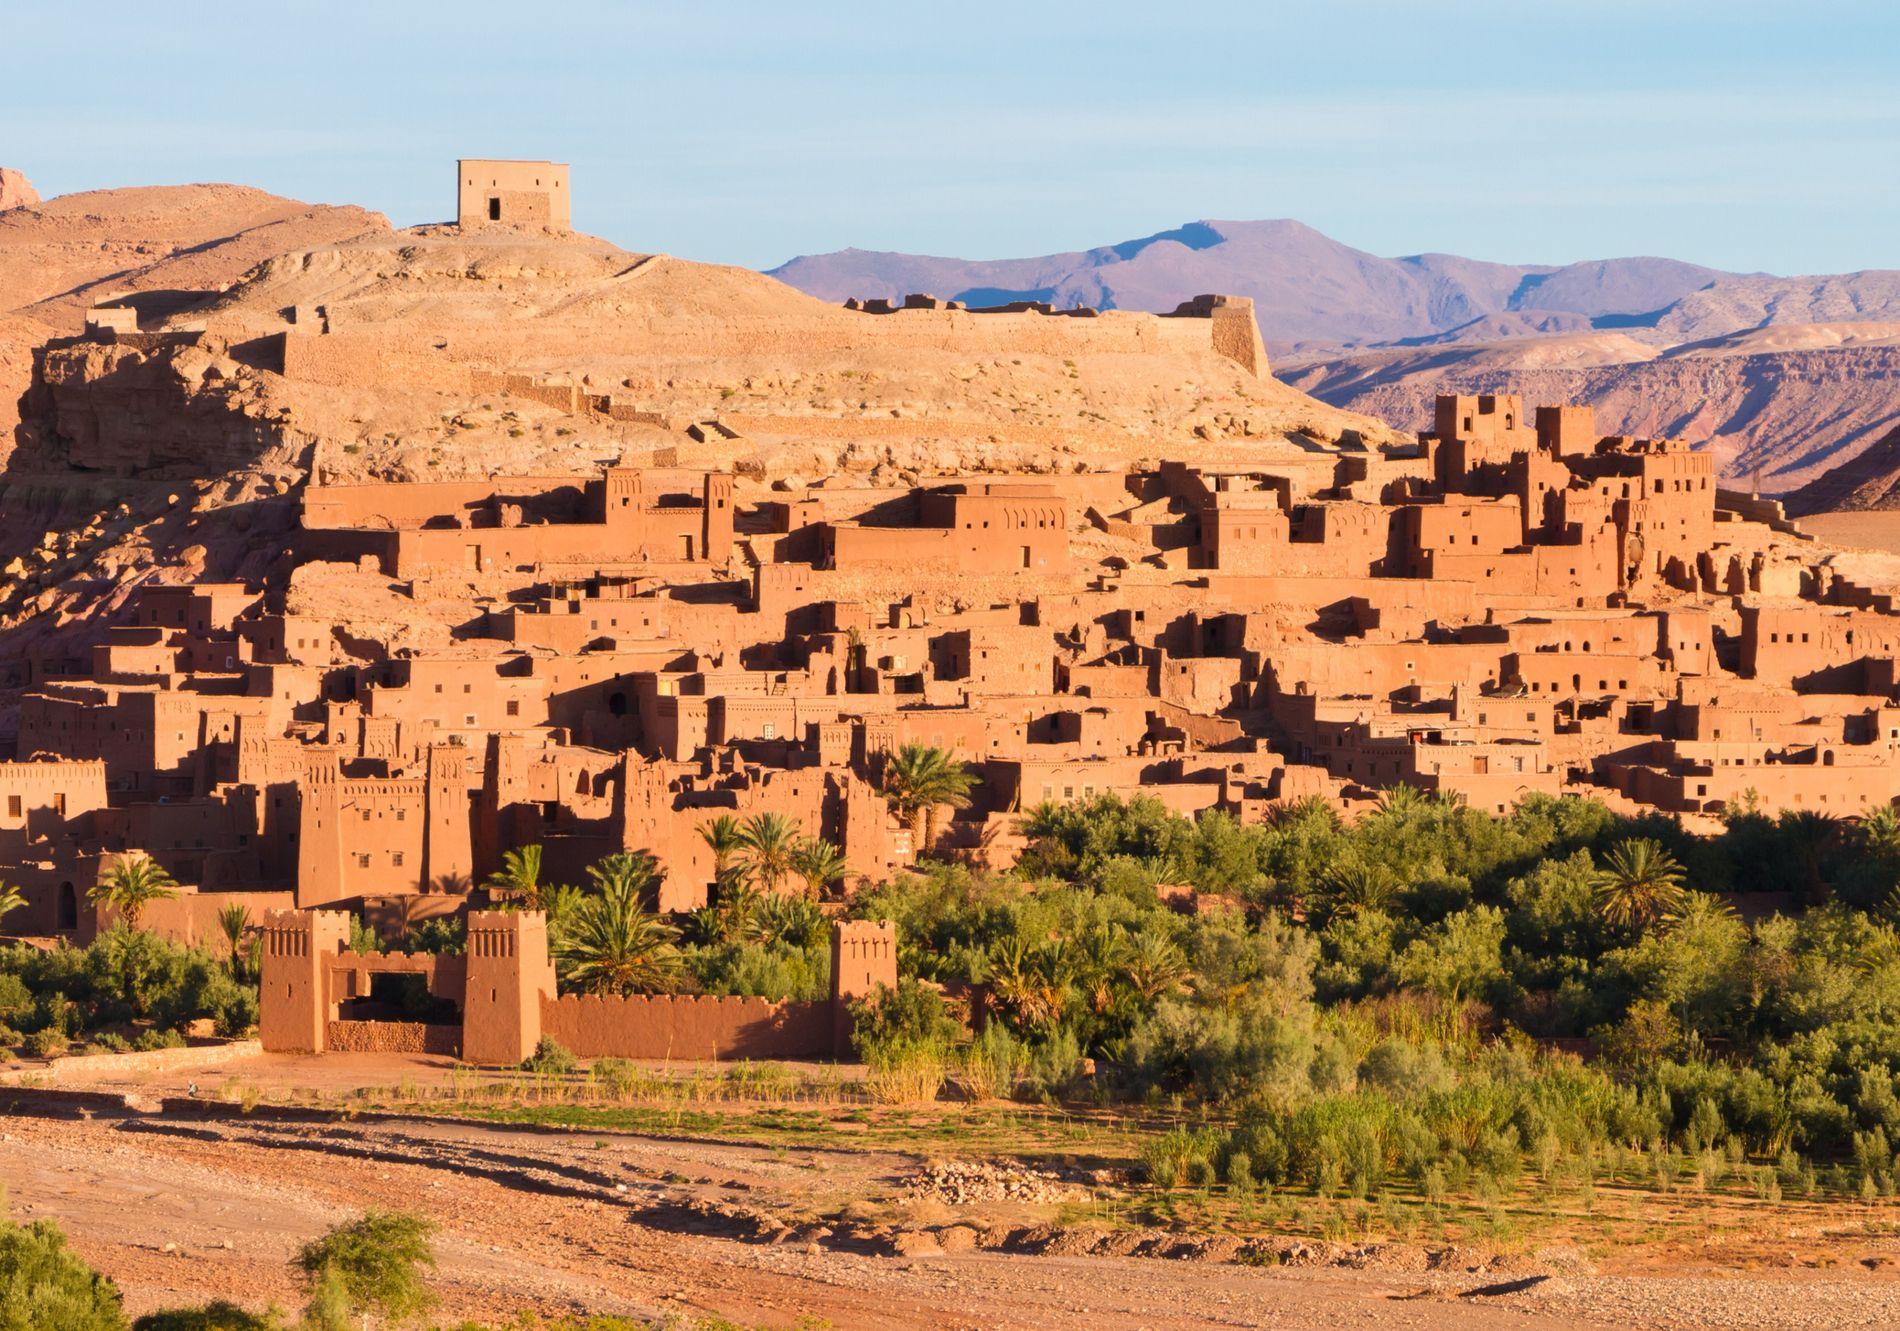 Die Kasbah Taourirt bei Ouarzazate